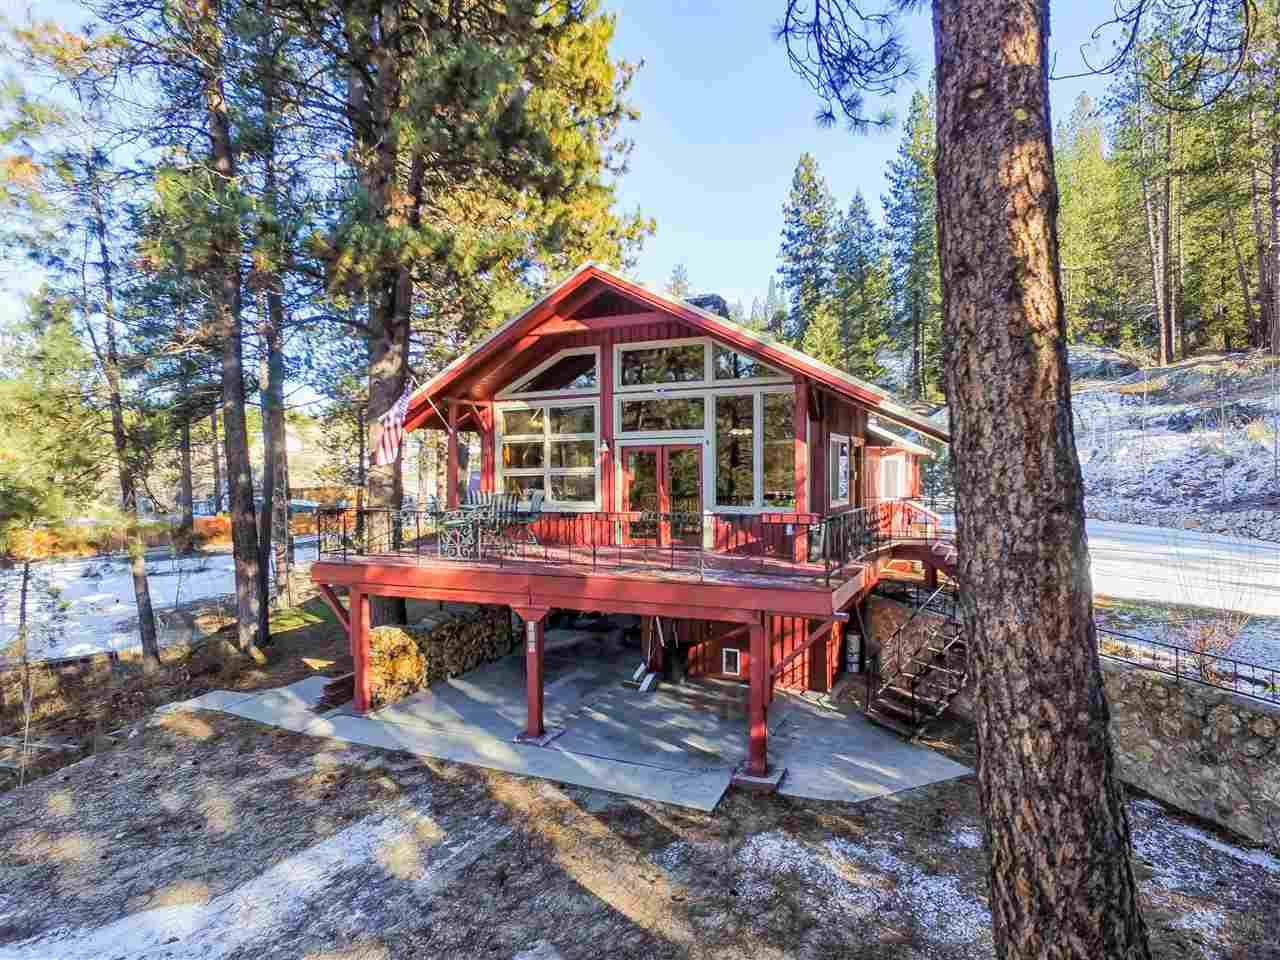 Single Family Home for Sale at 100 Williams Drive 100 Williams Drive Idaho City, Idaho 83631